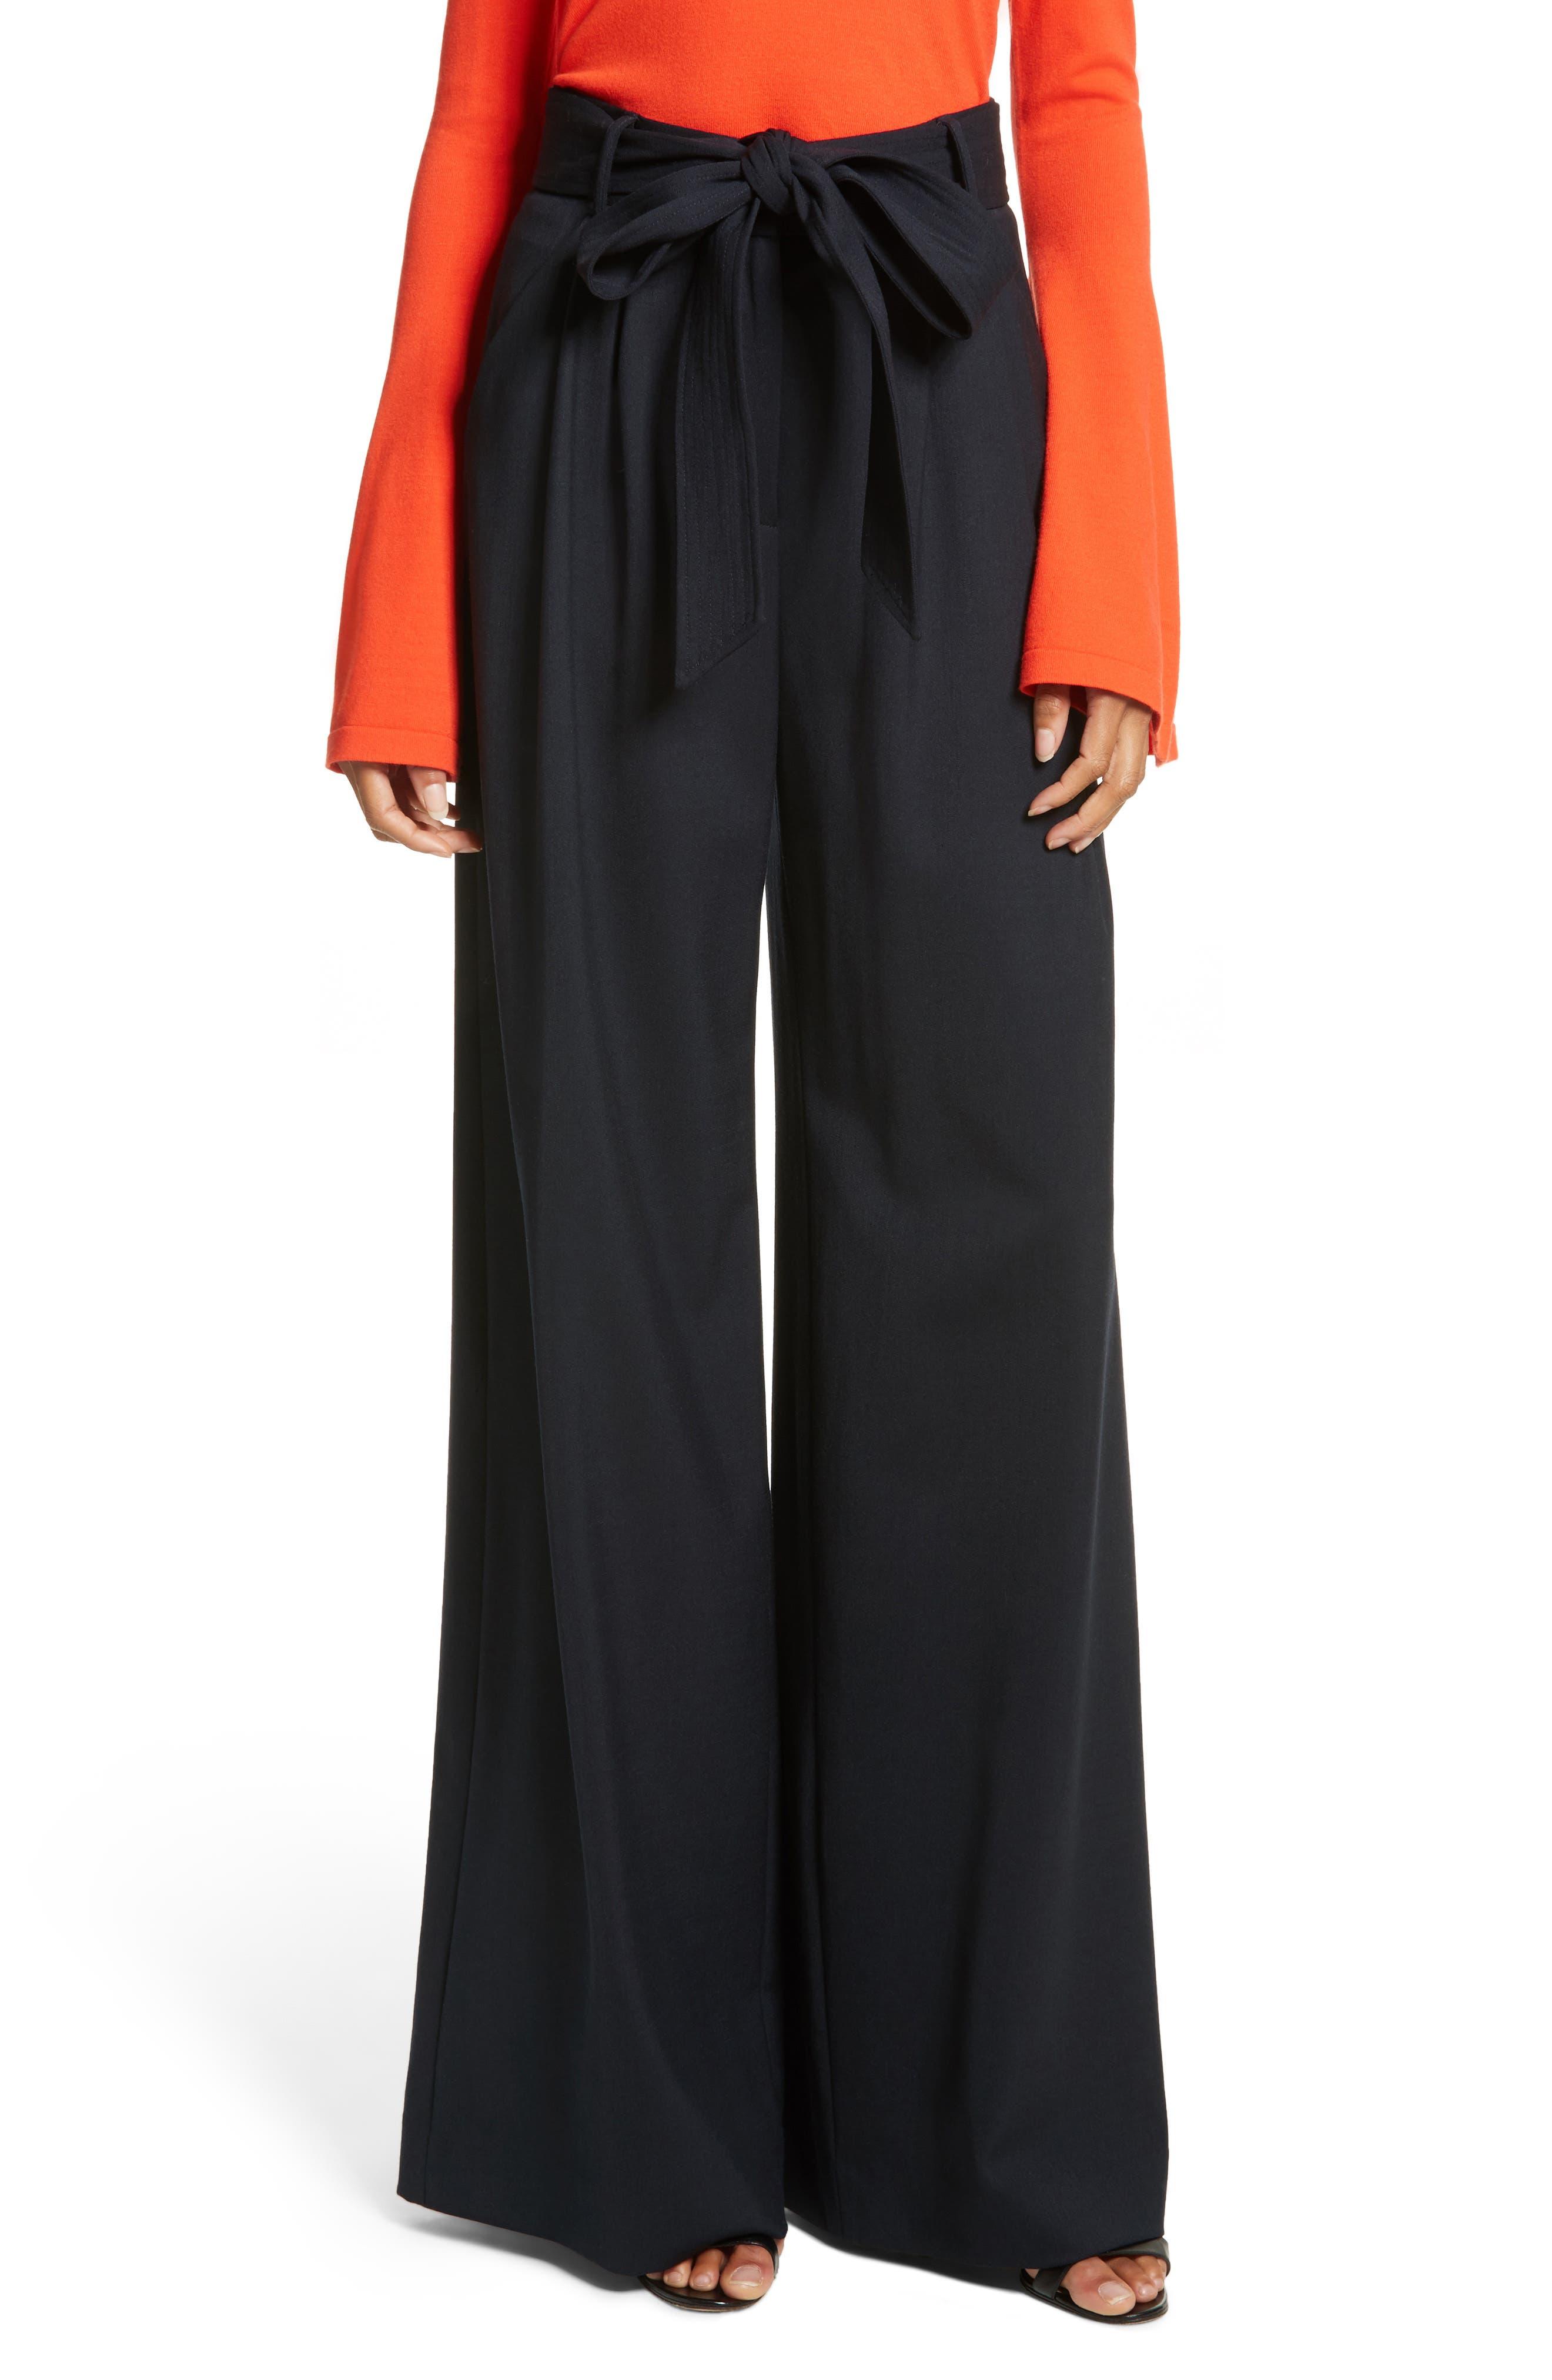 Milly Italian Gabardine Trapunto Trousers